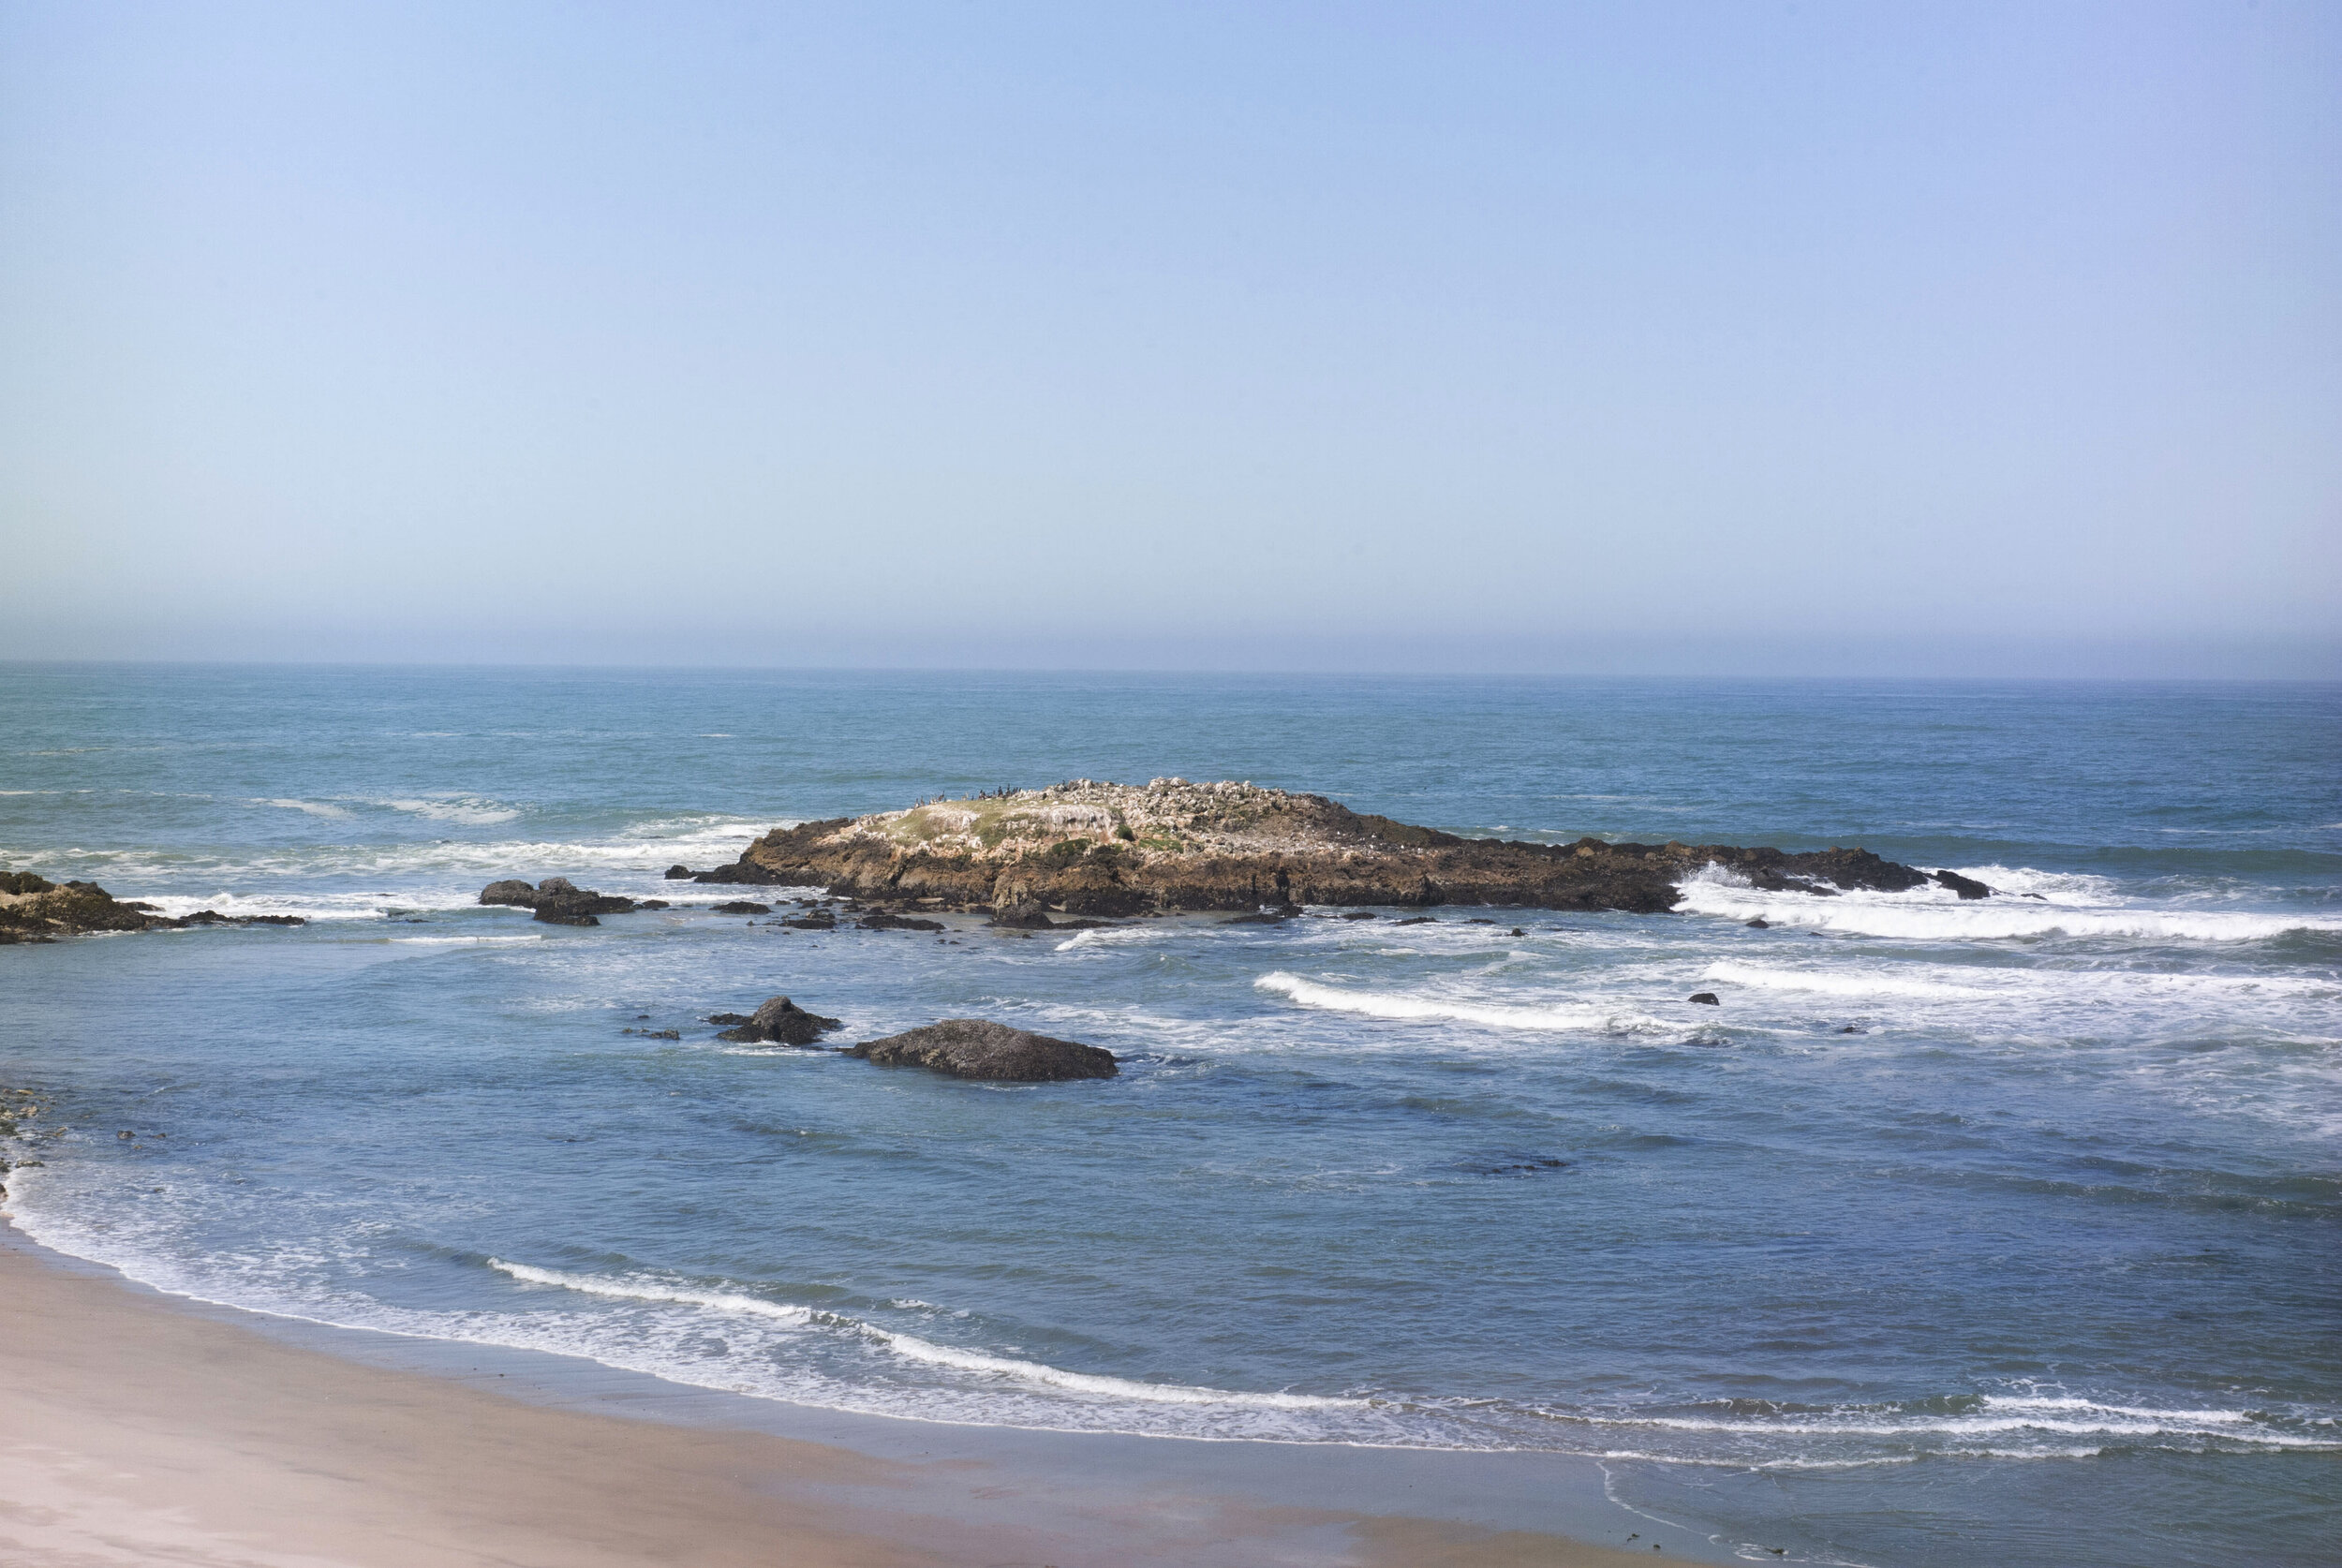 Pacific #1 - Wandering between San Mateo and Los Angeles…